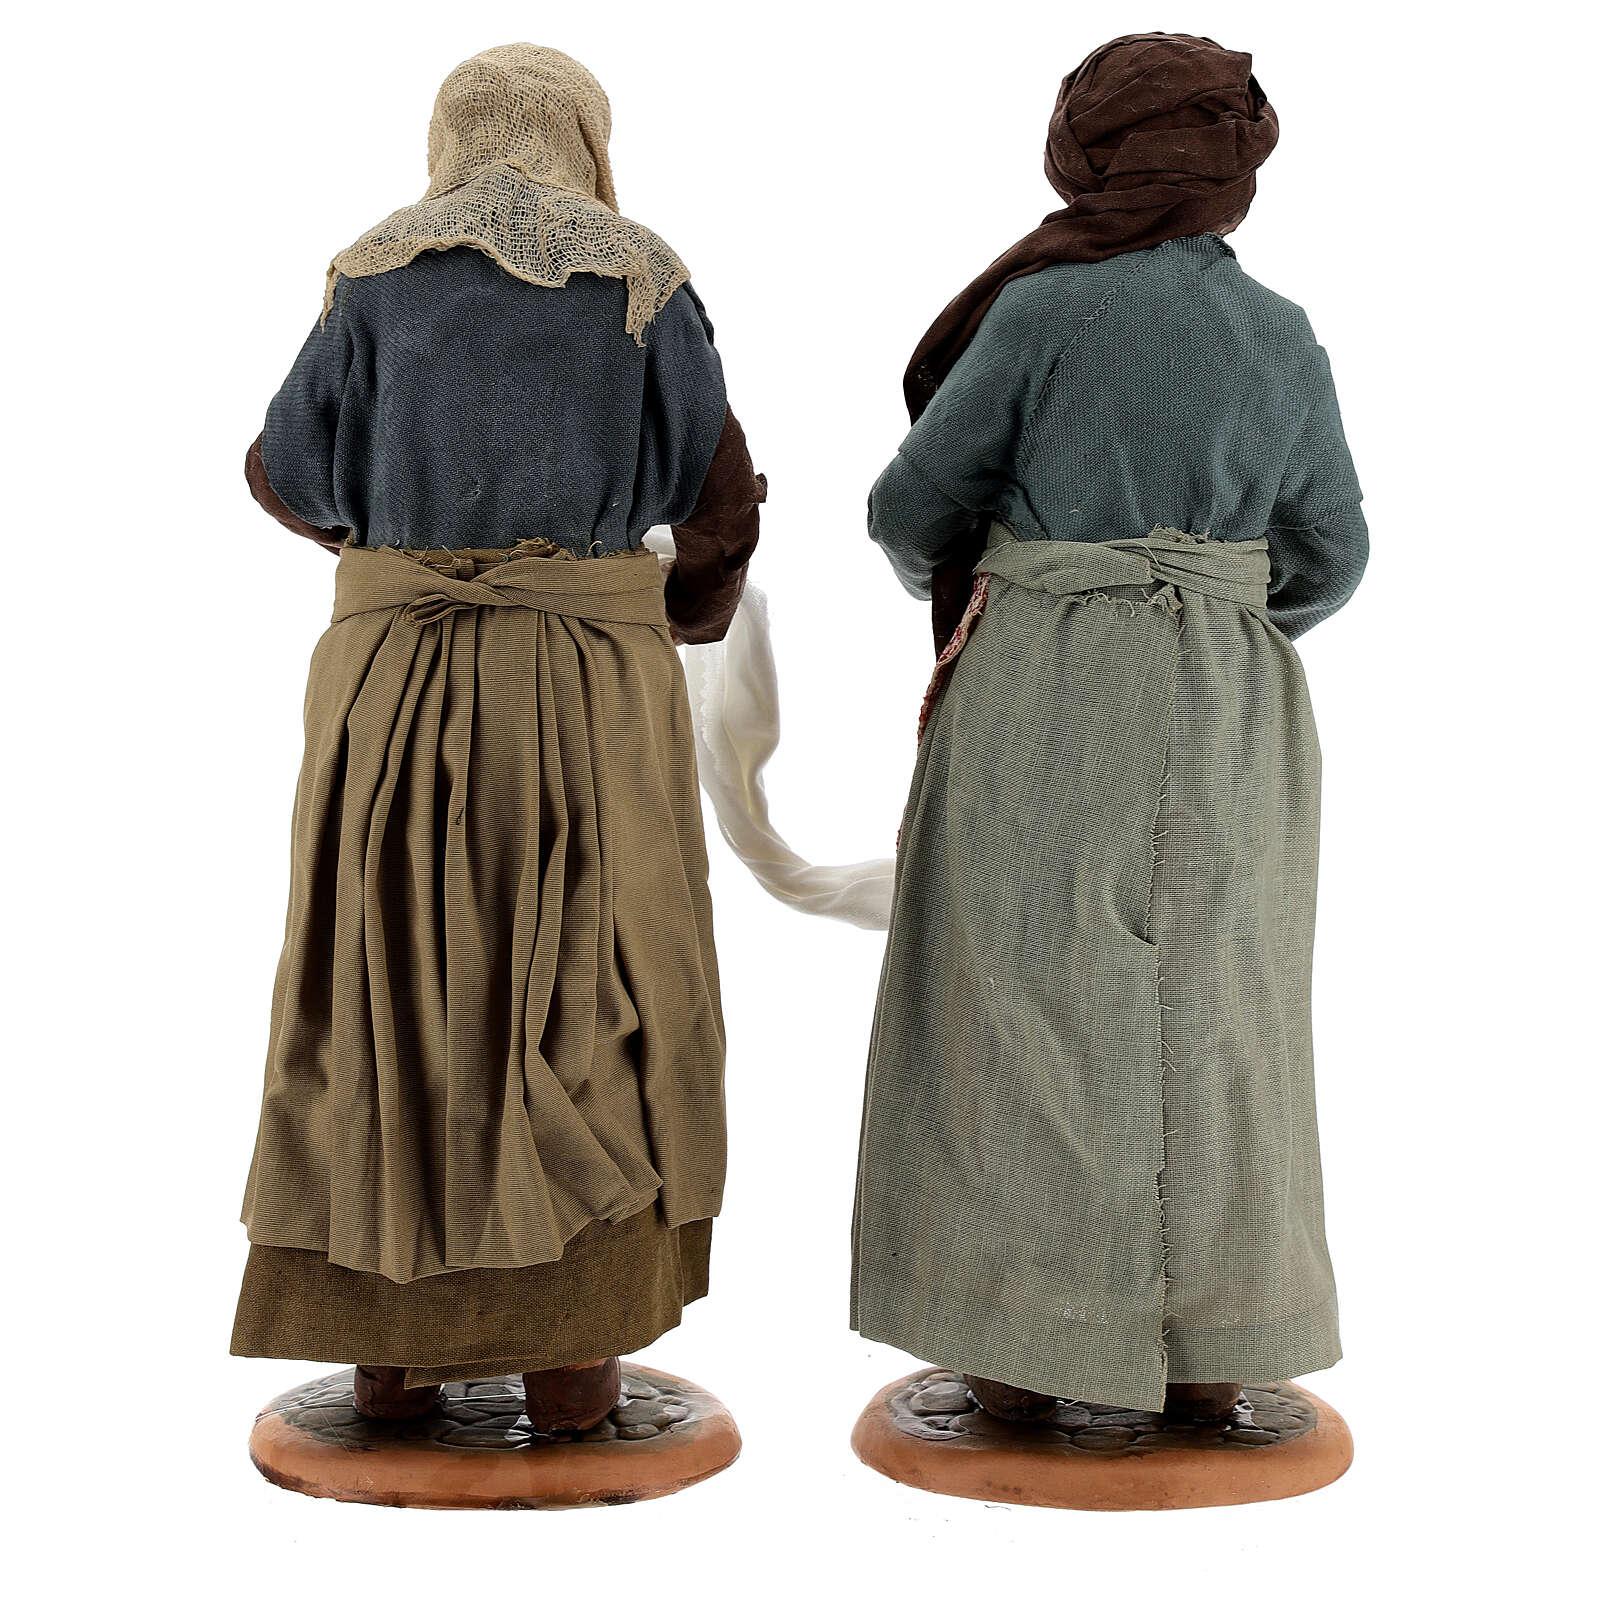 Women wringing out cloths figurines 30 cm Napolitan Nativity 4